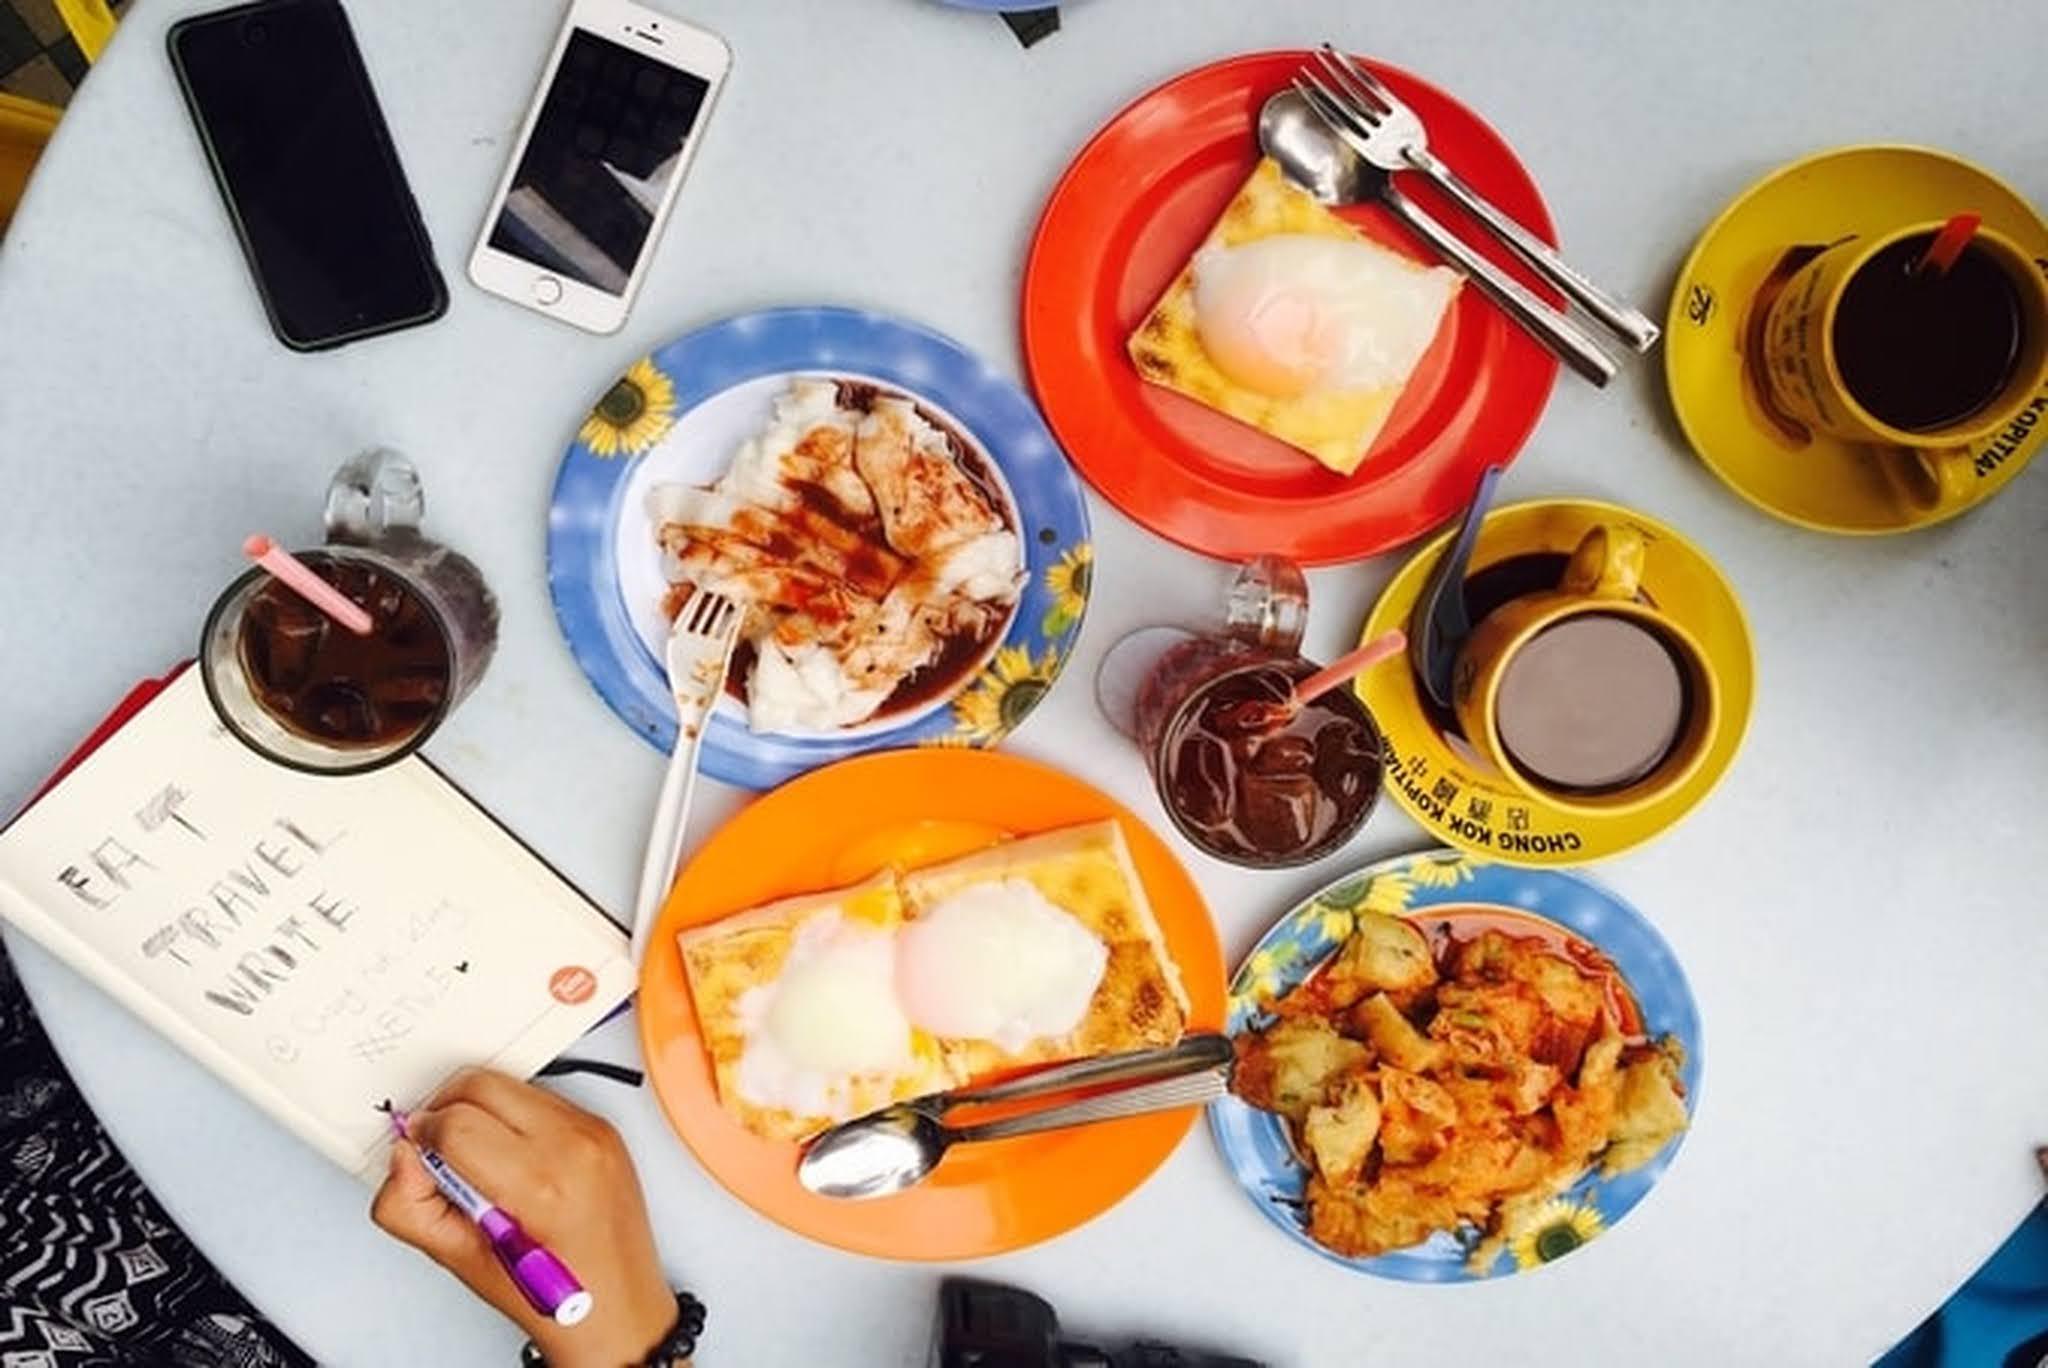 A Day in Selangor, Let's Visit Klang